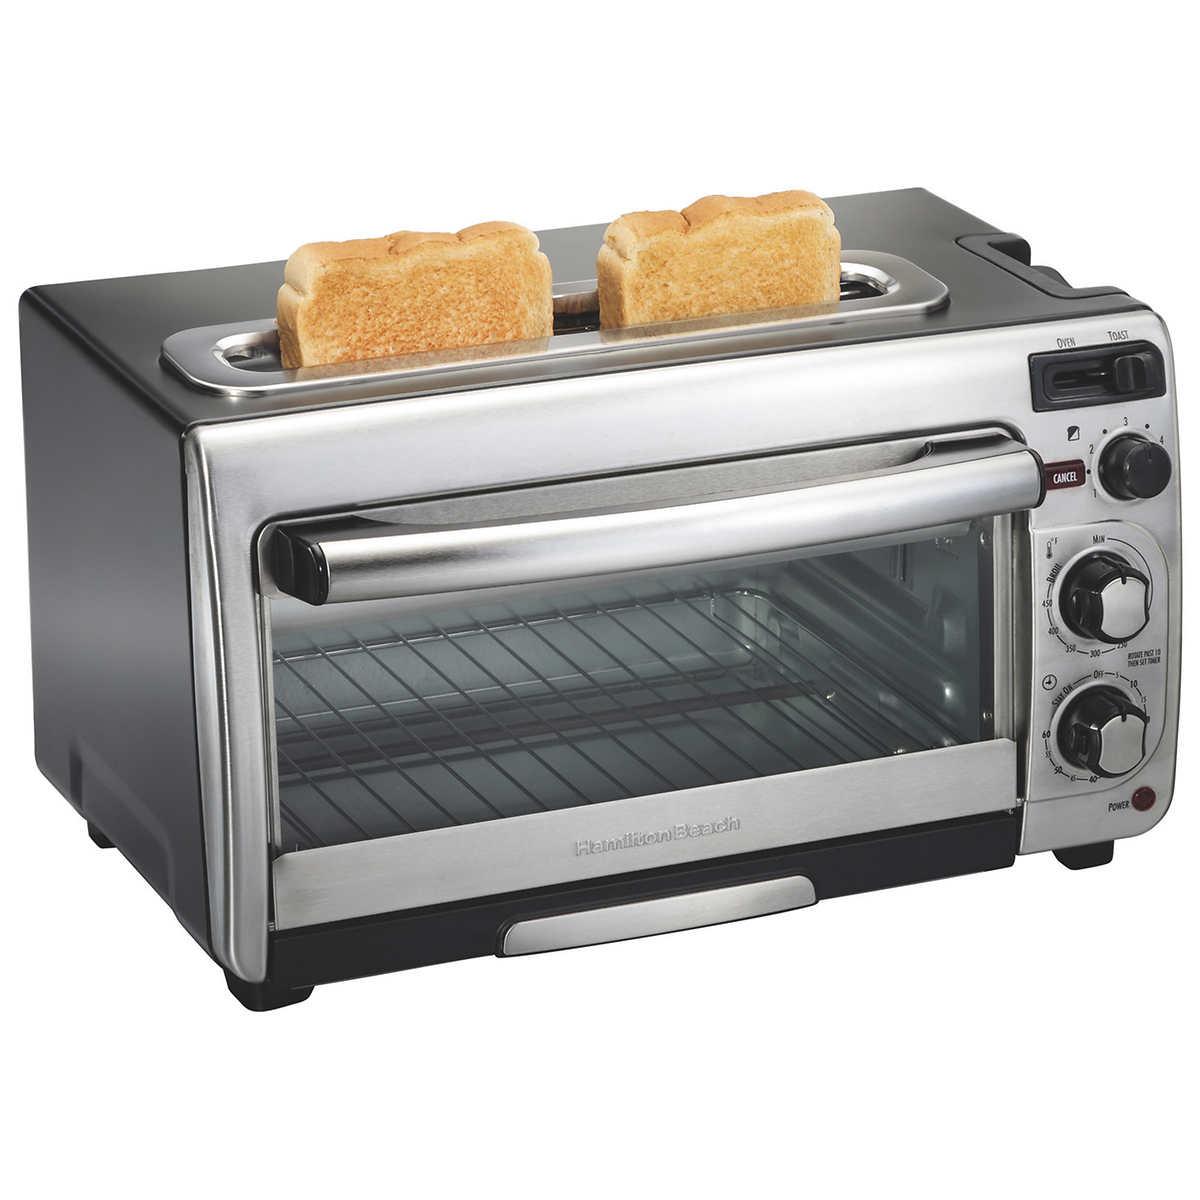 Niedlich Toaster Ofen Drahtgestell Fotos - Verdrahtungsideen ...